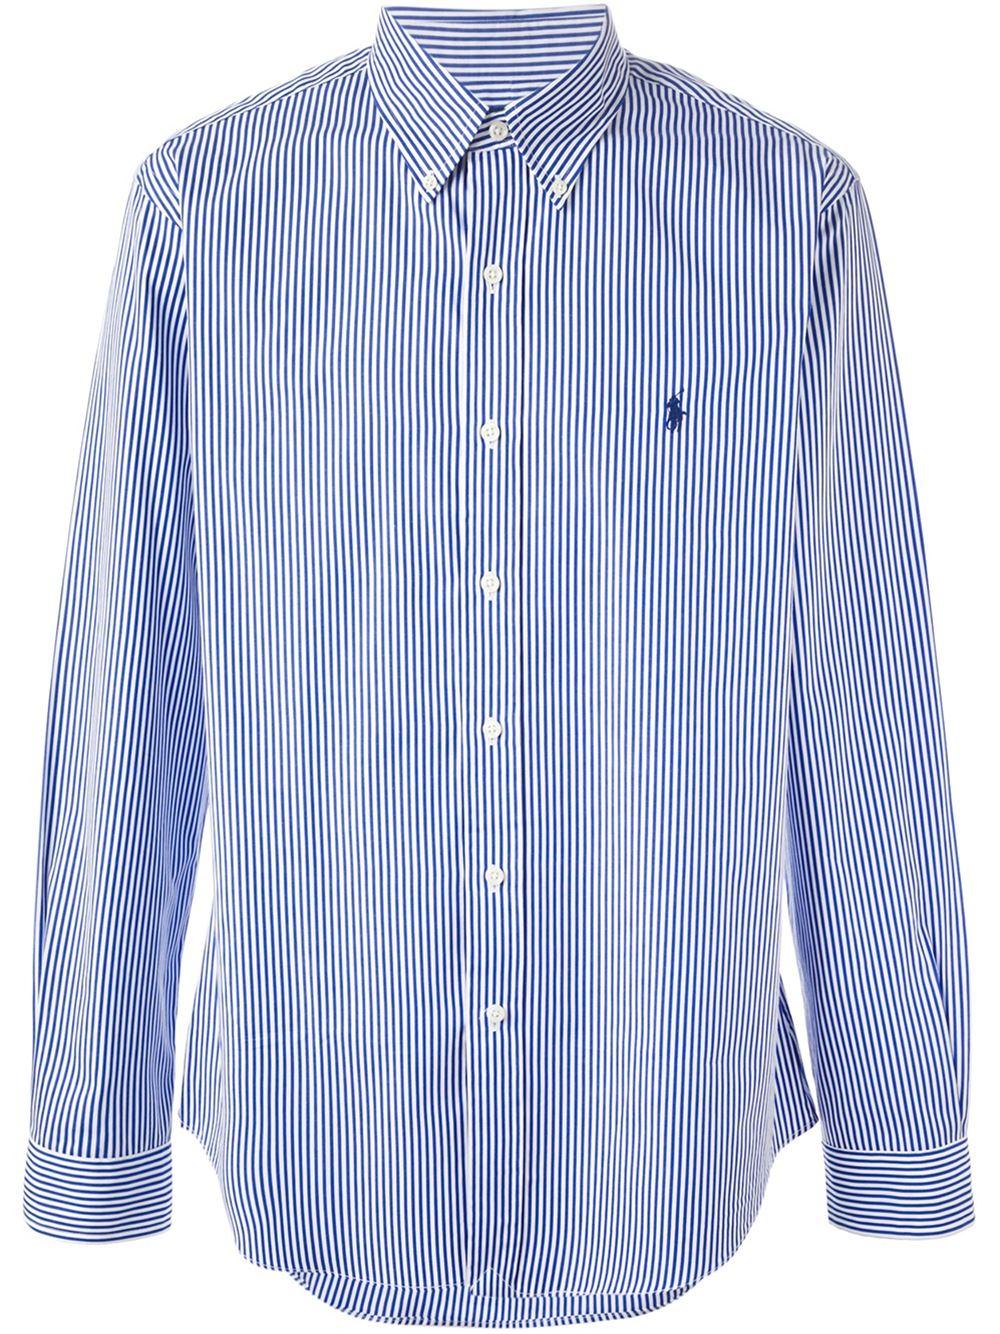 Polo ralph lauren striped button down shirt in blue for for Striped button down shirts for men